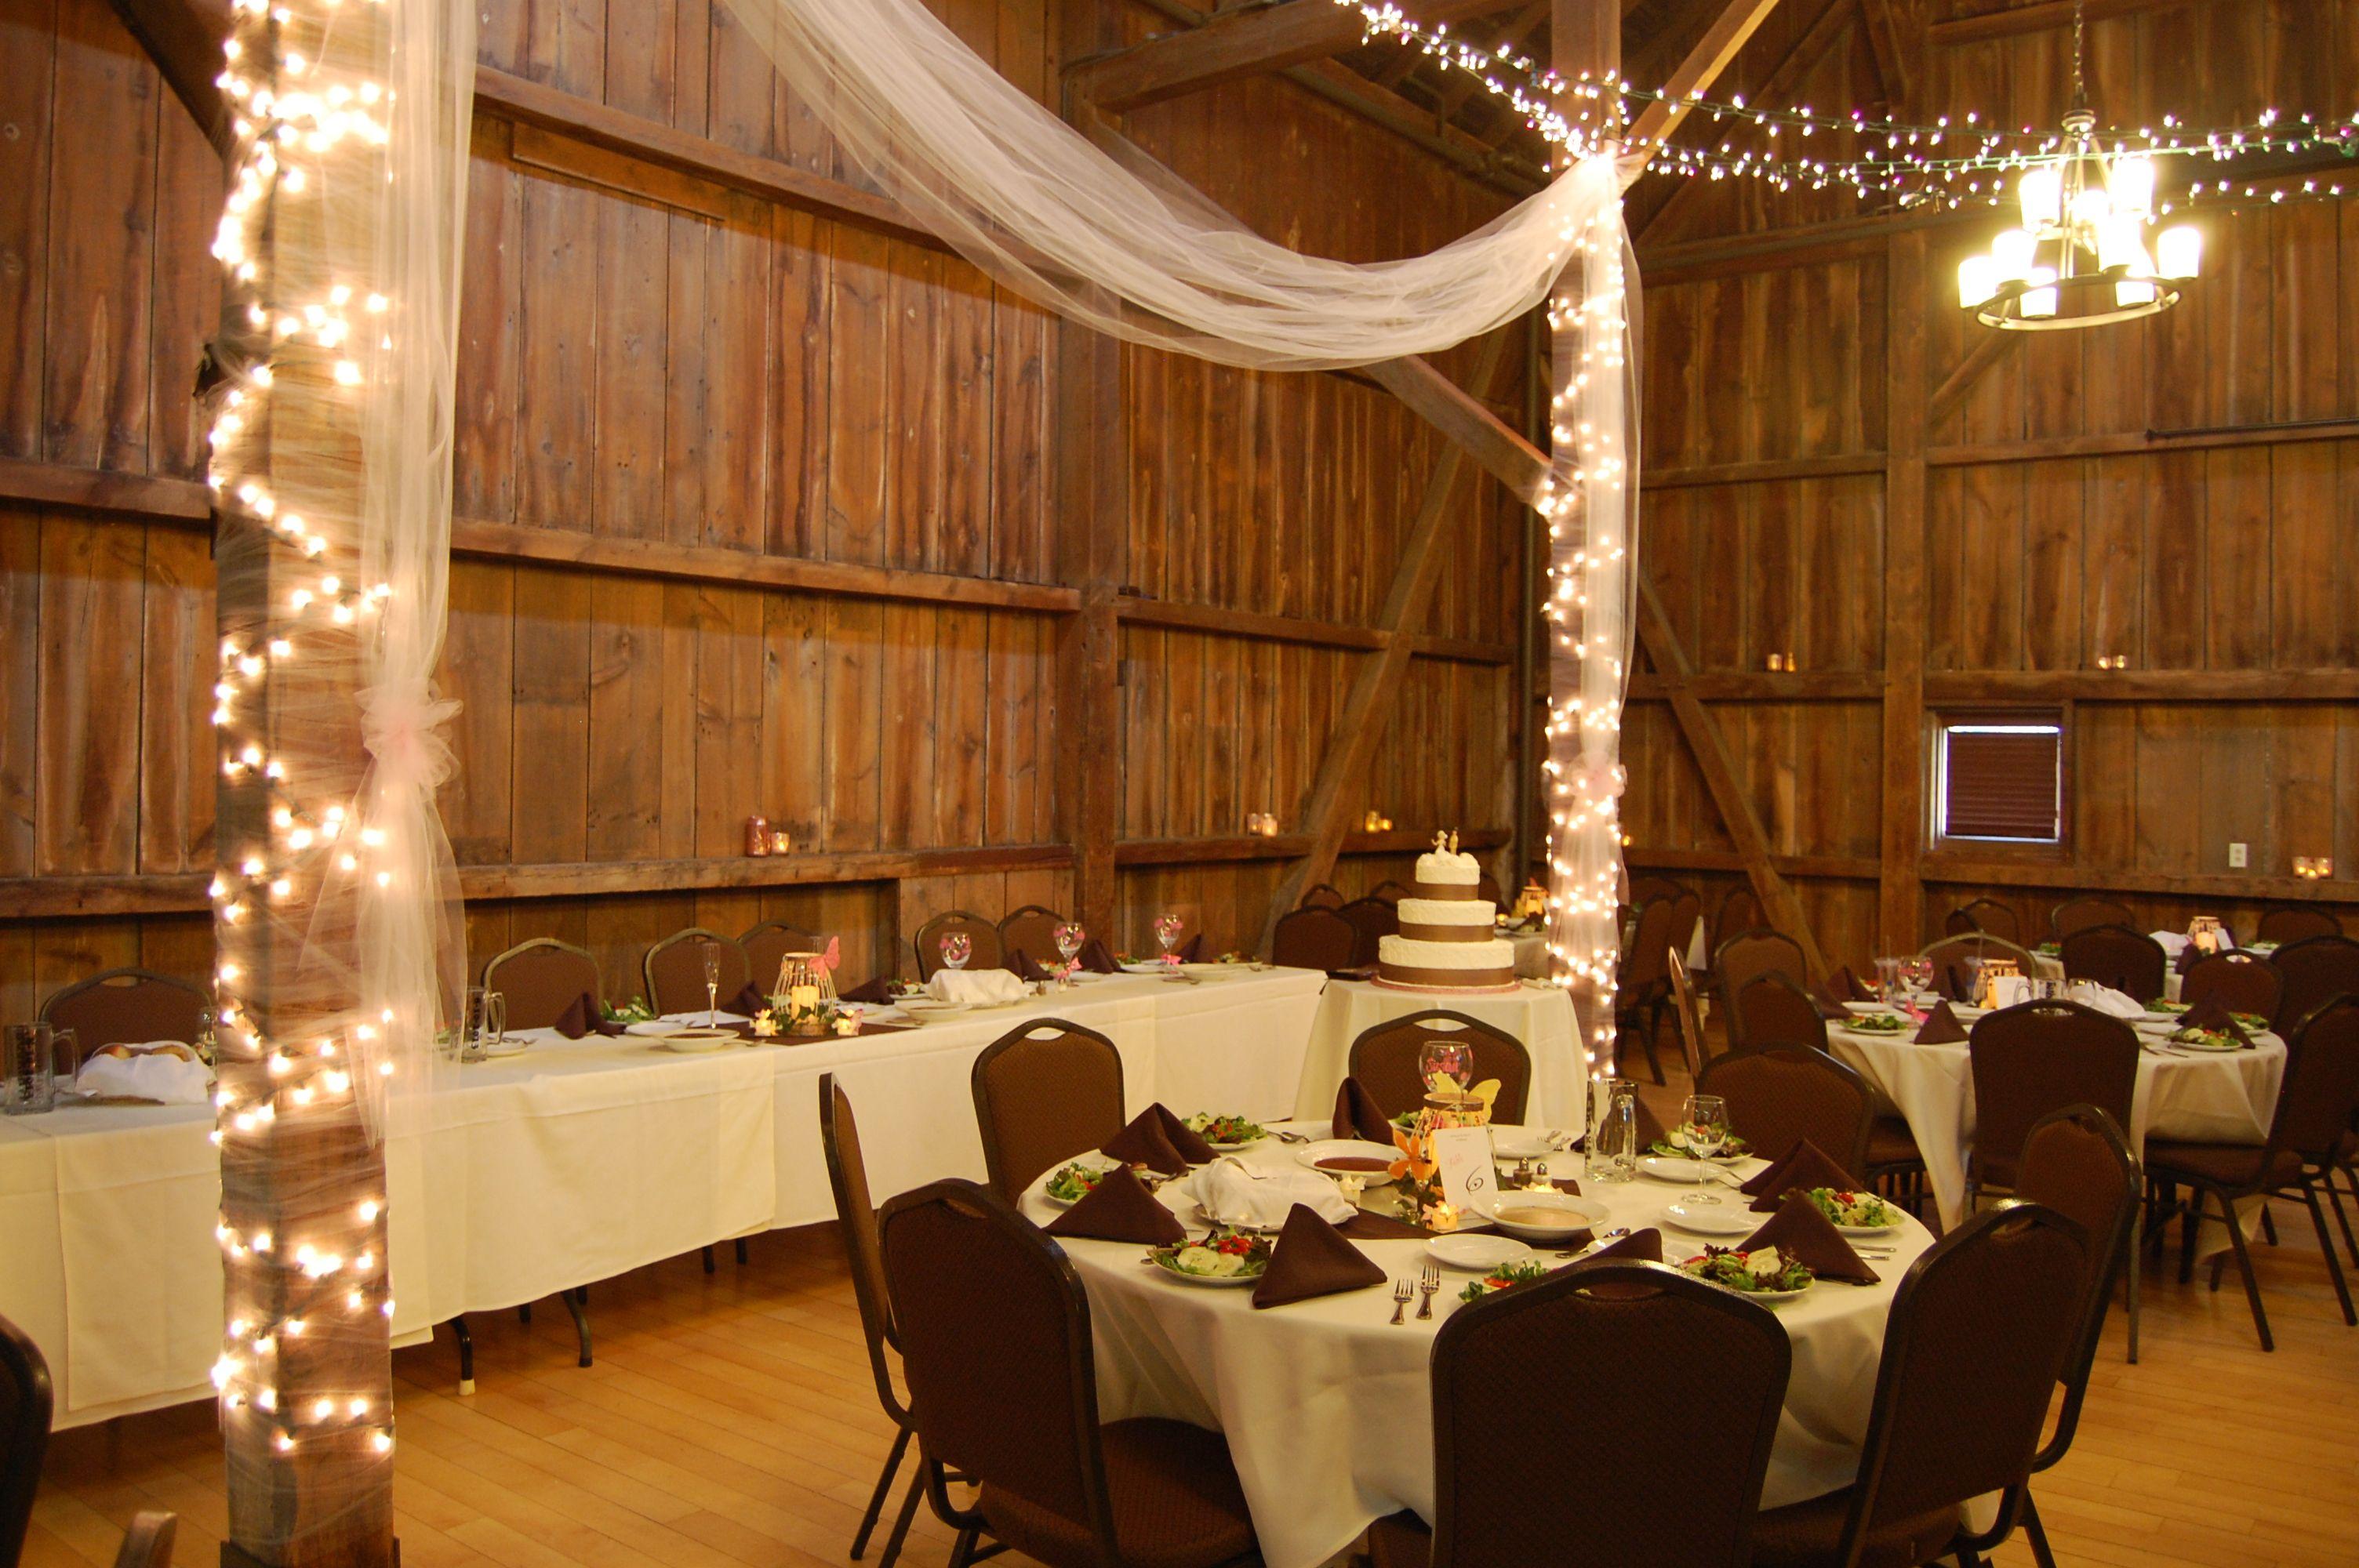 hoosier grove barn wedding | Barn dance party, Mom wedding ...